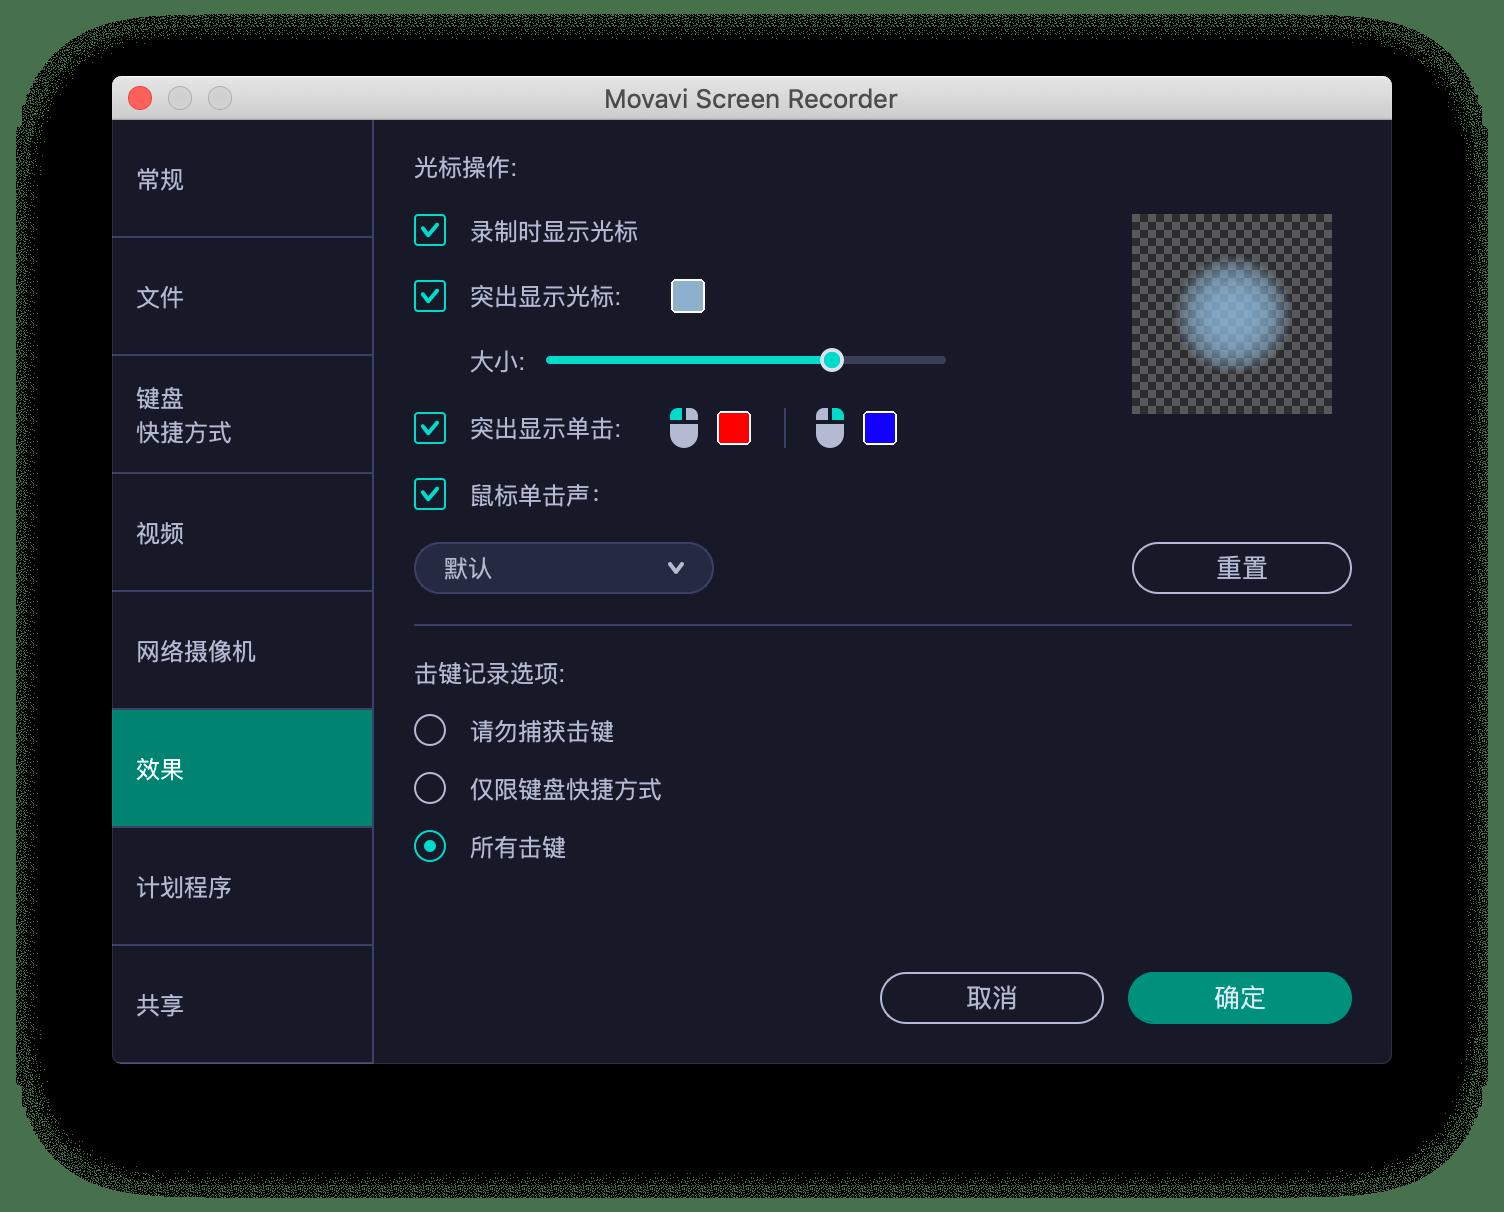 Movavi Screen Recorder 11.6.0中文版